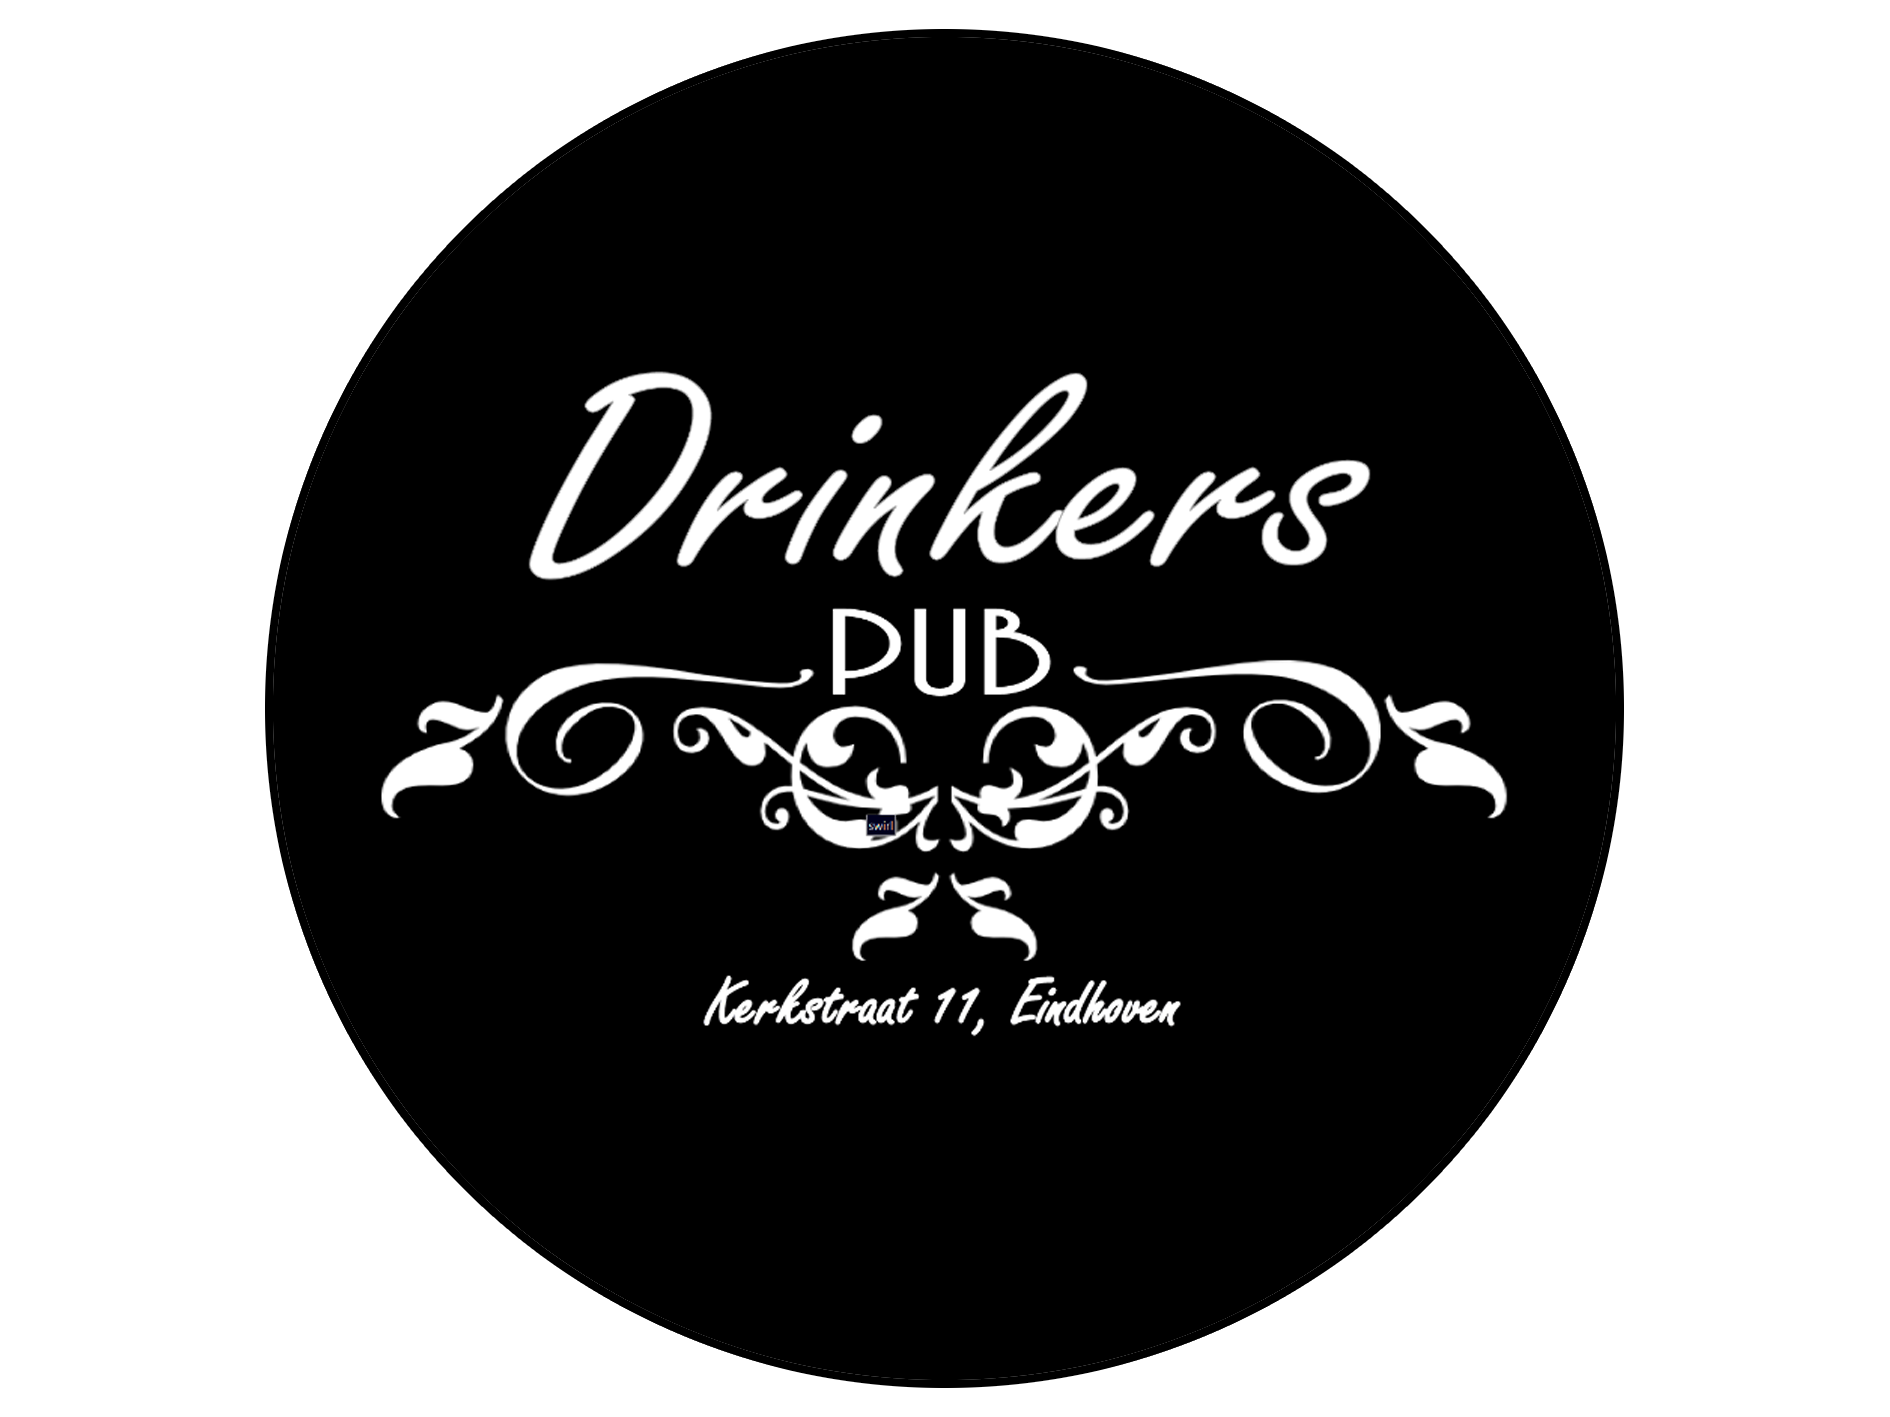 drinkerspub